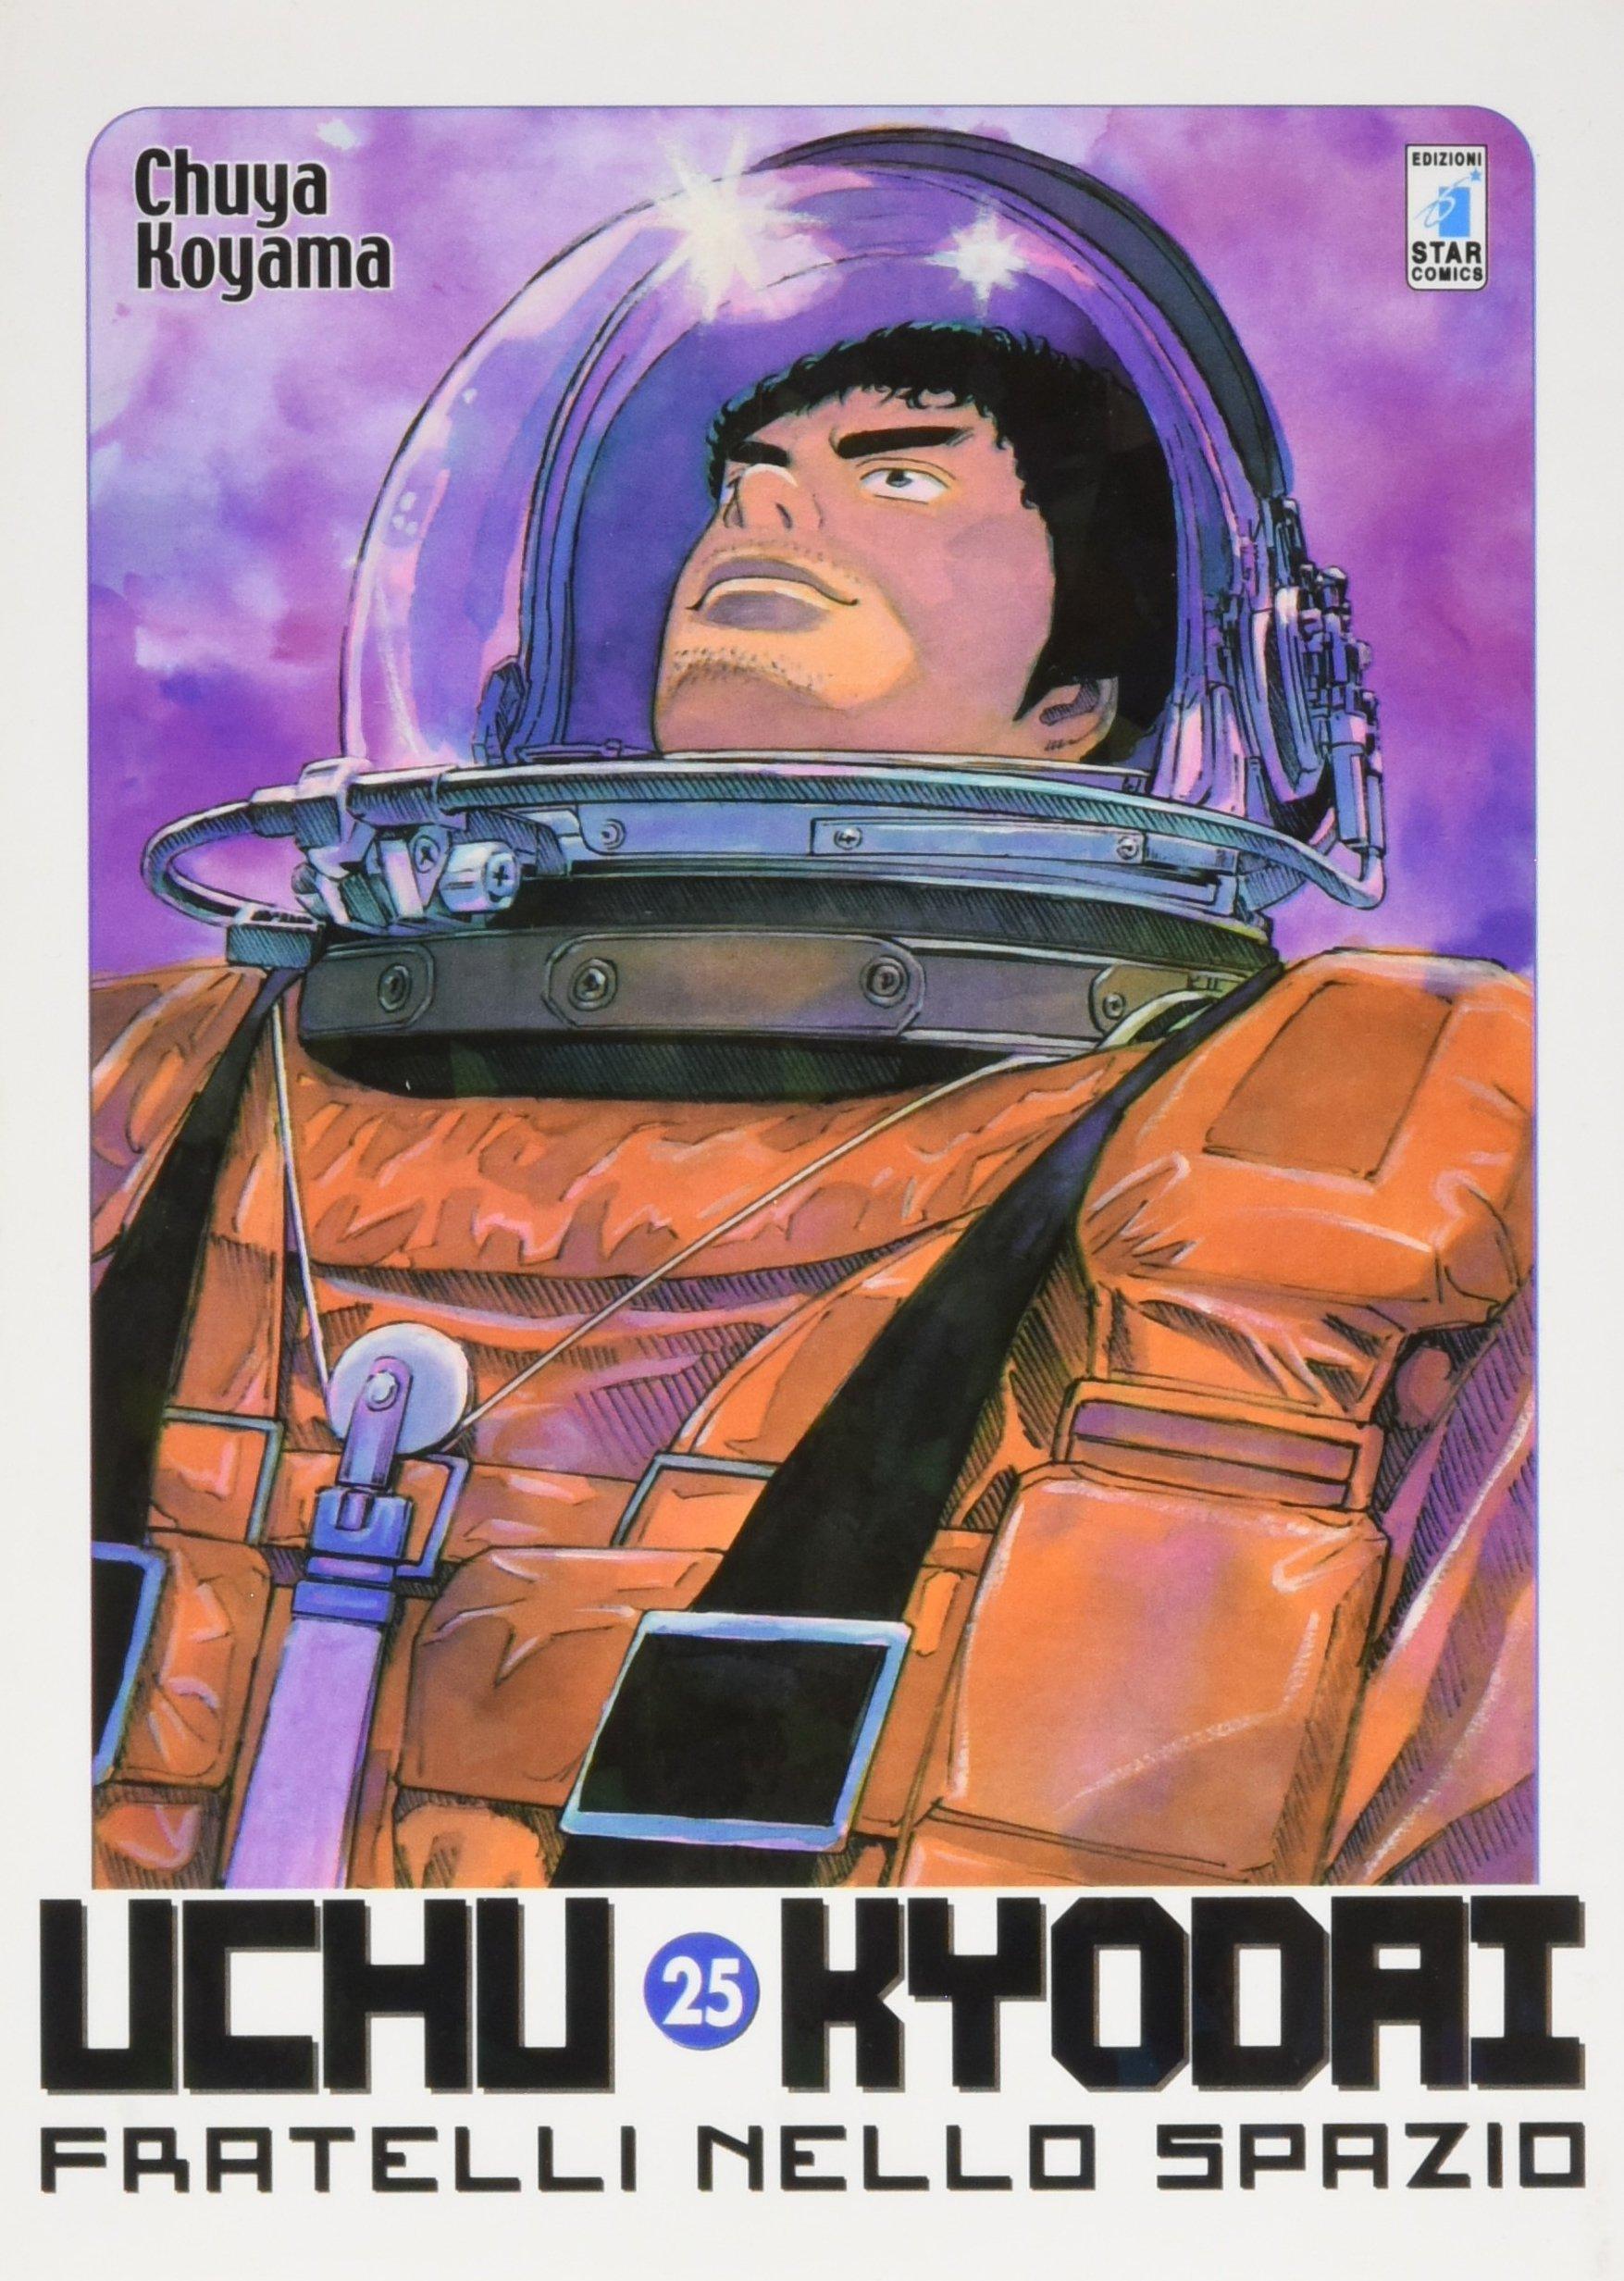 Uchu Kyodai. Fratelli nello spazio: 25 Copertina flessibile – 8 ago 2016 Chuya Koyama E. Cellie C. Toba Star Comics